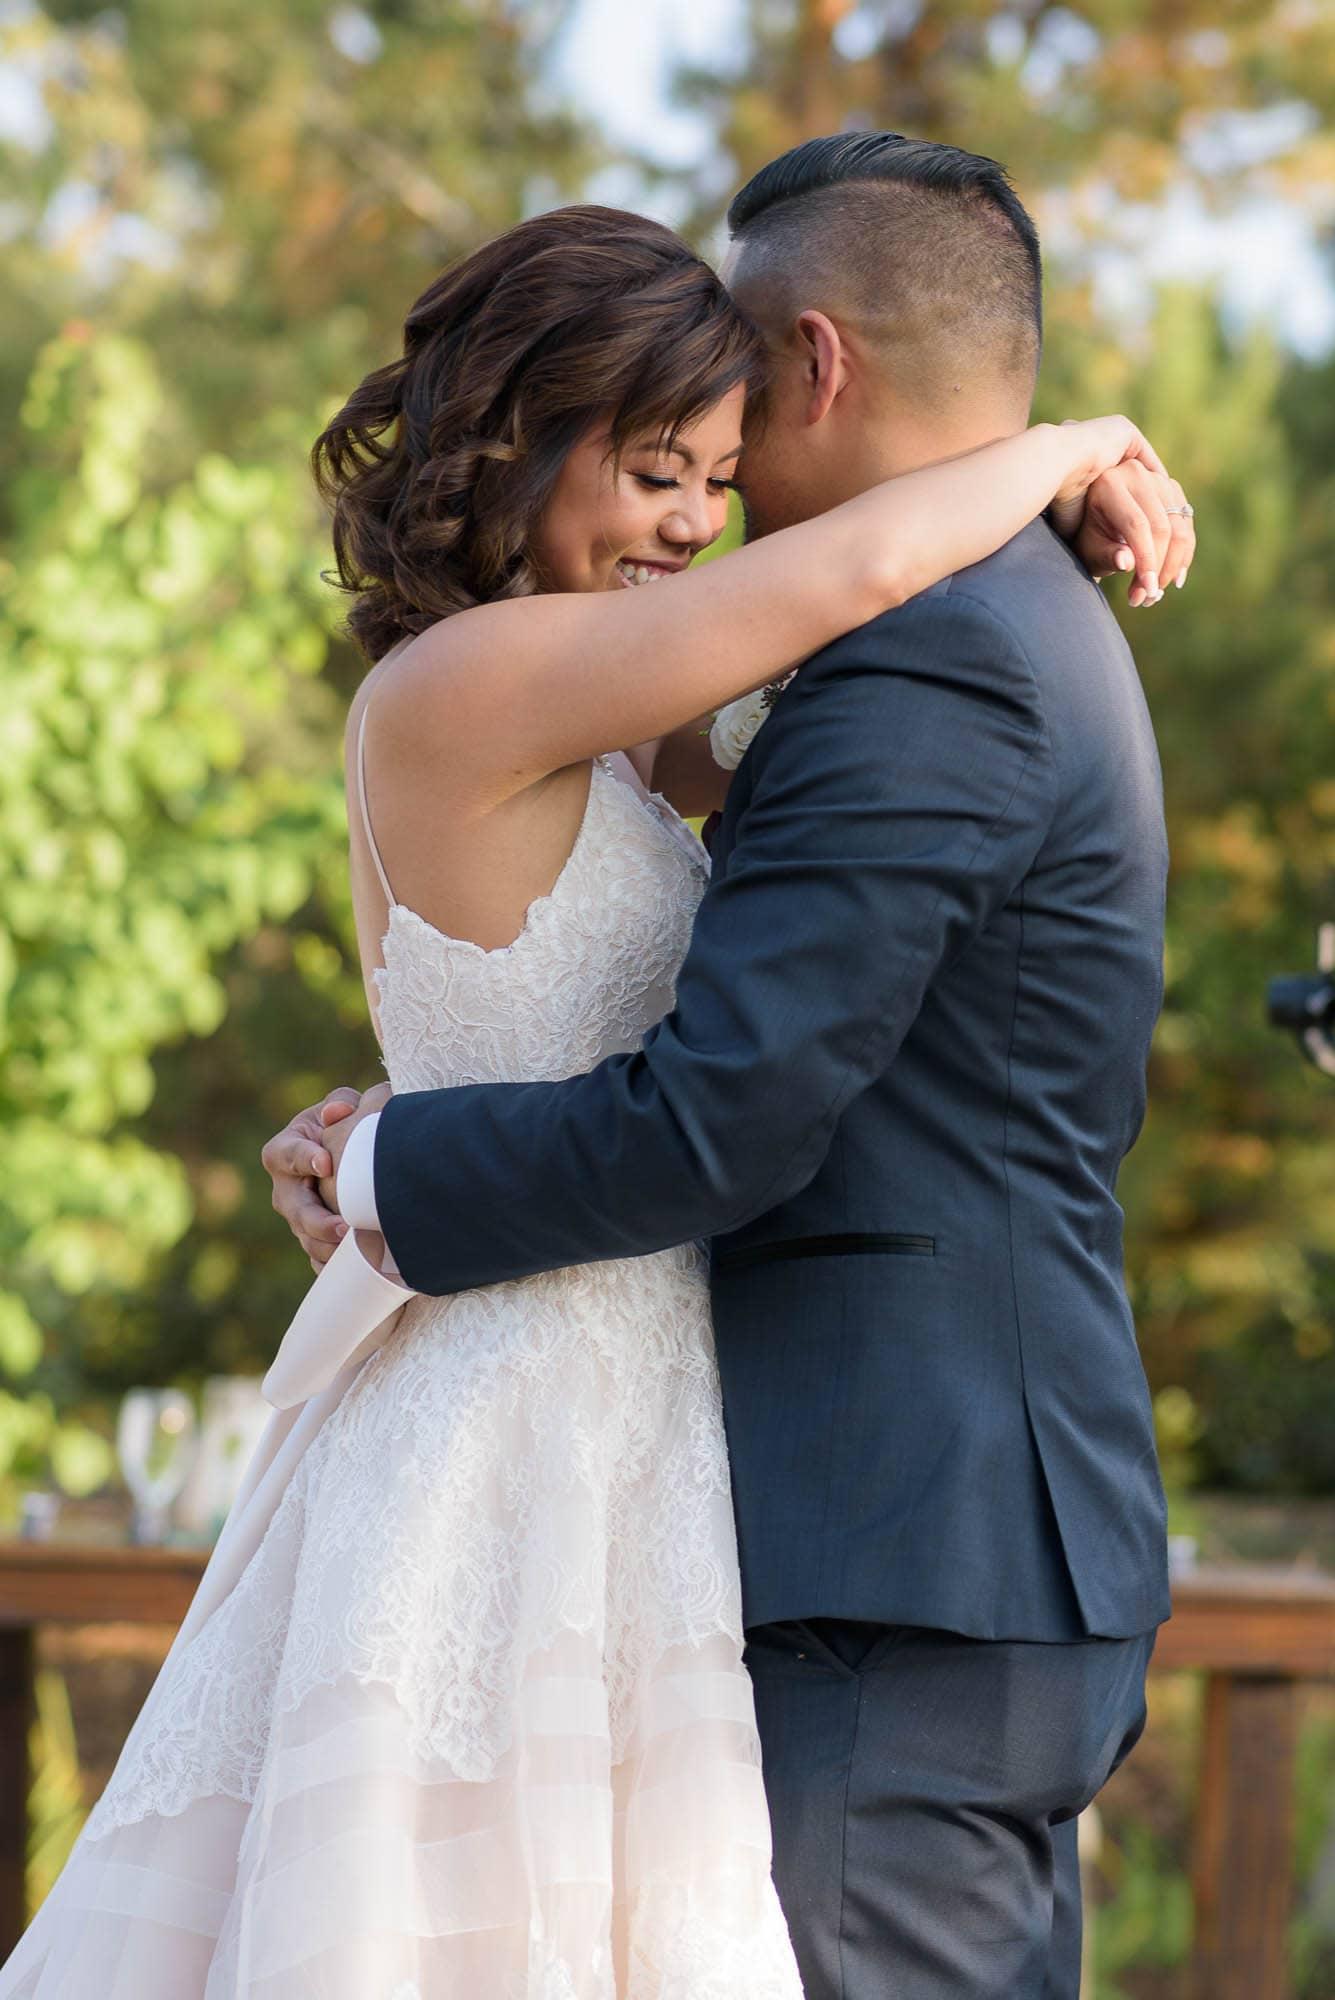 036_Alan_and_Heidi_Wedding_Karla_Paolo